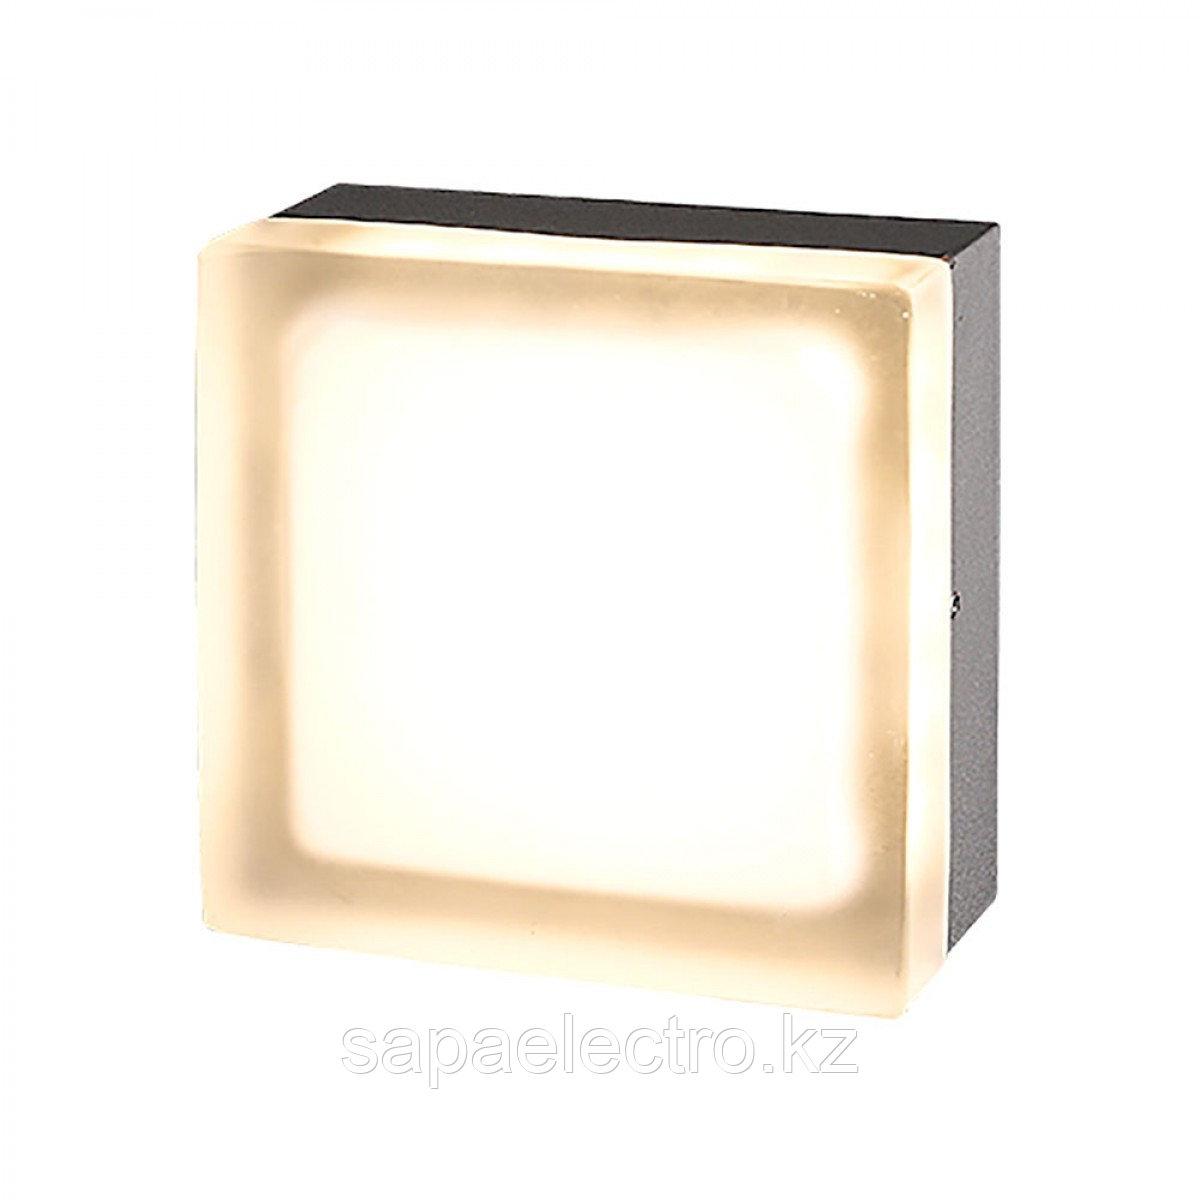 Свет-к LED 1781 SILVER  5W 4500K IP54(TEKSAN)12шт